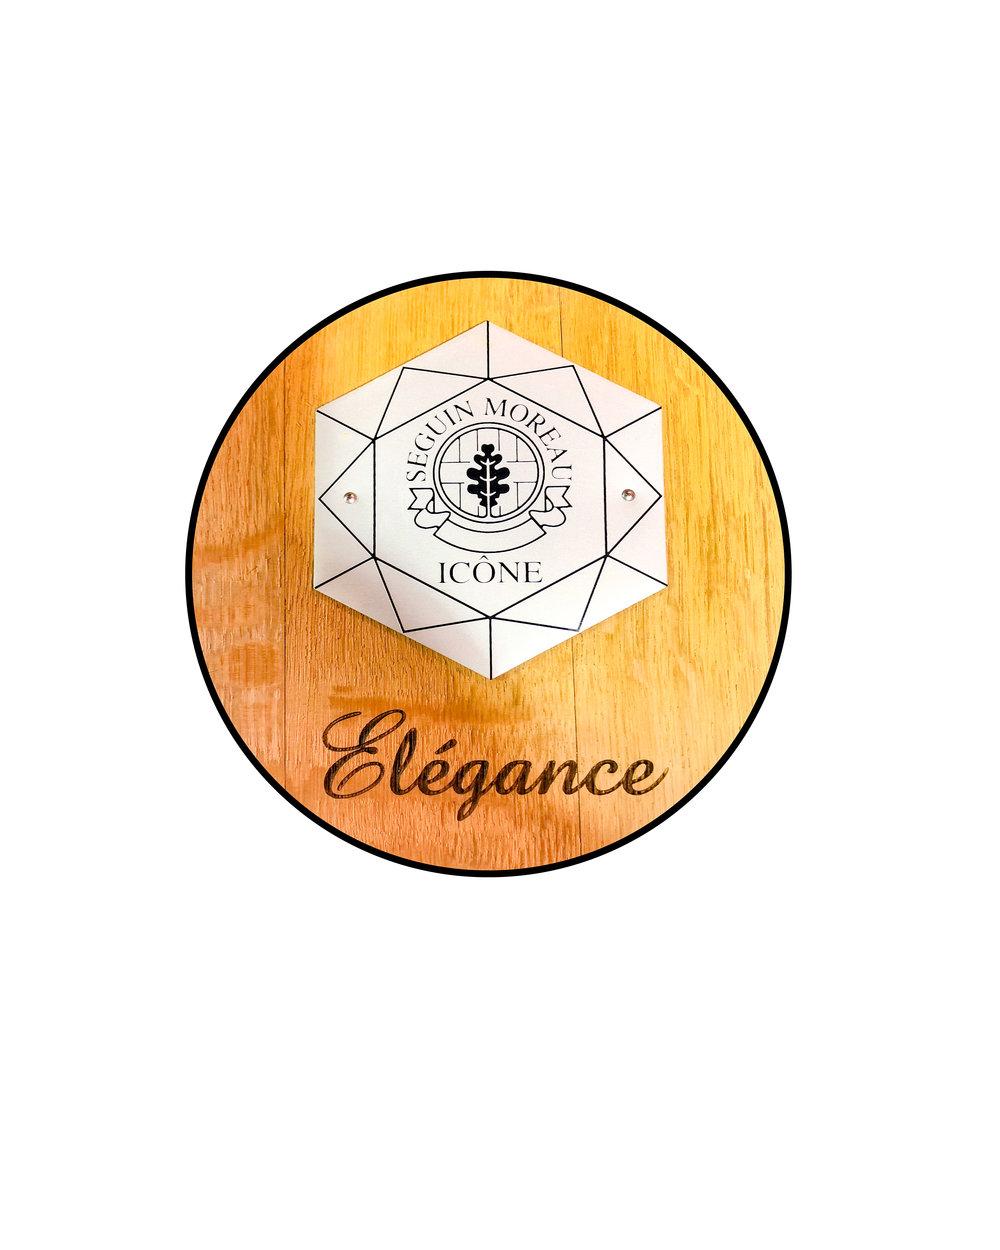 Seguin Moreau-Elegance-Barrrel Head.jpg